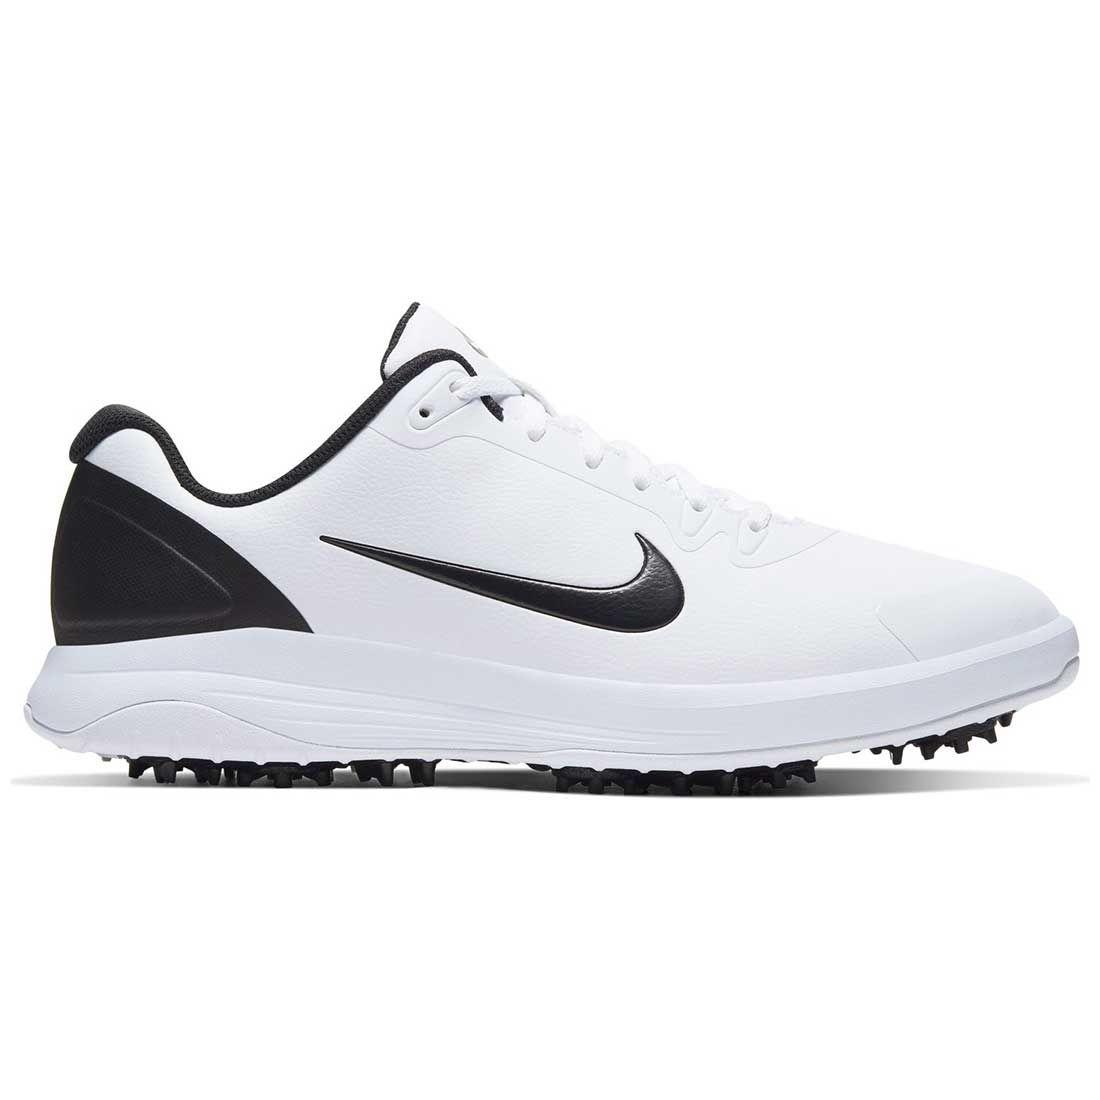 Buy Nike Infinity G Golf Shoes White